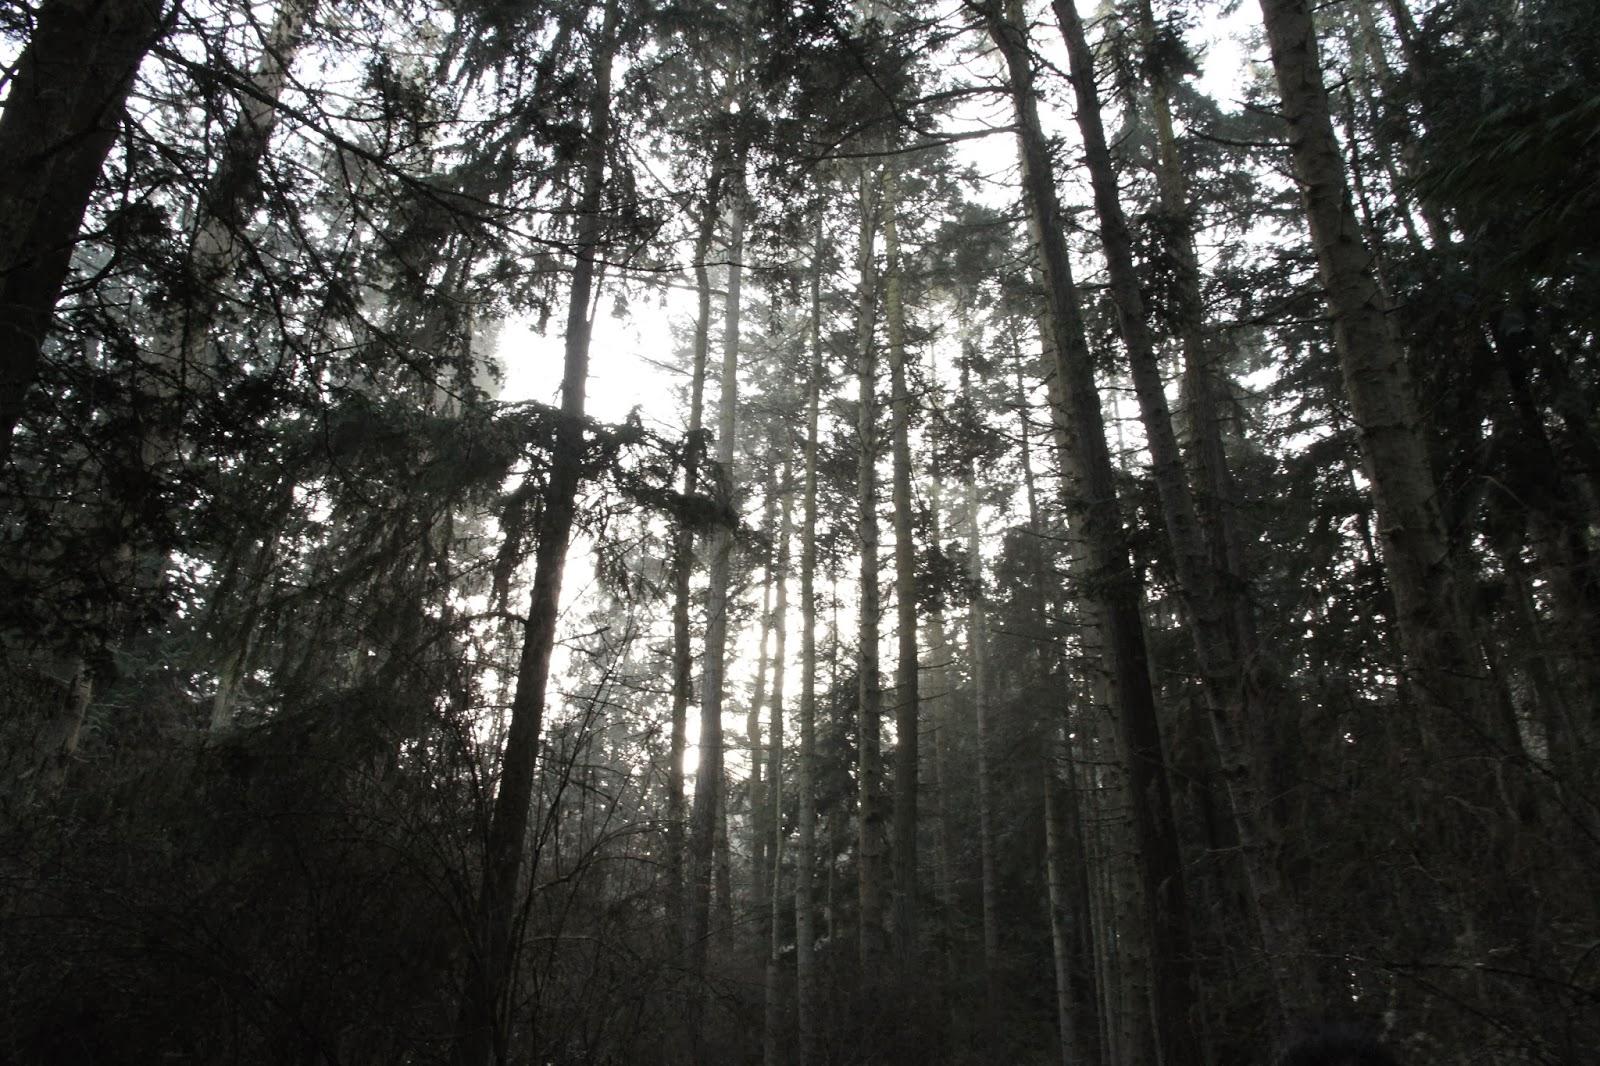 Dungeness-Spit-8.jpg